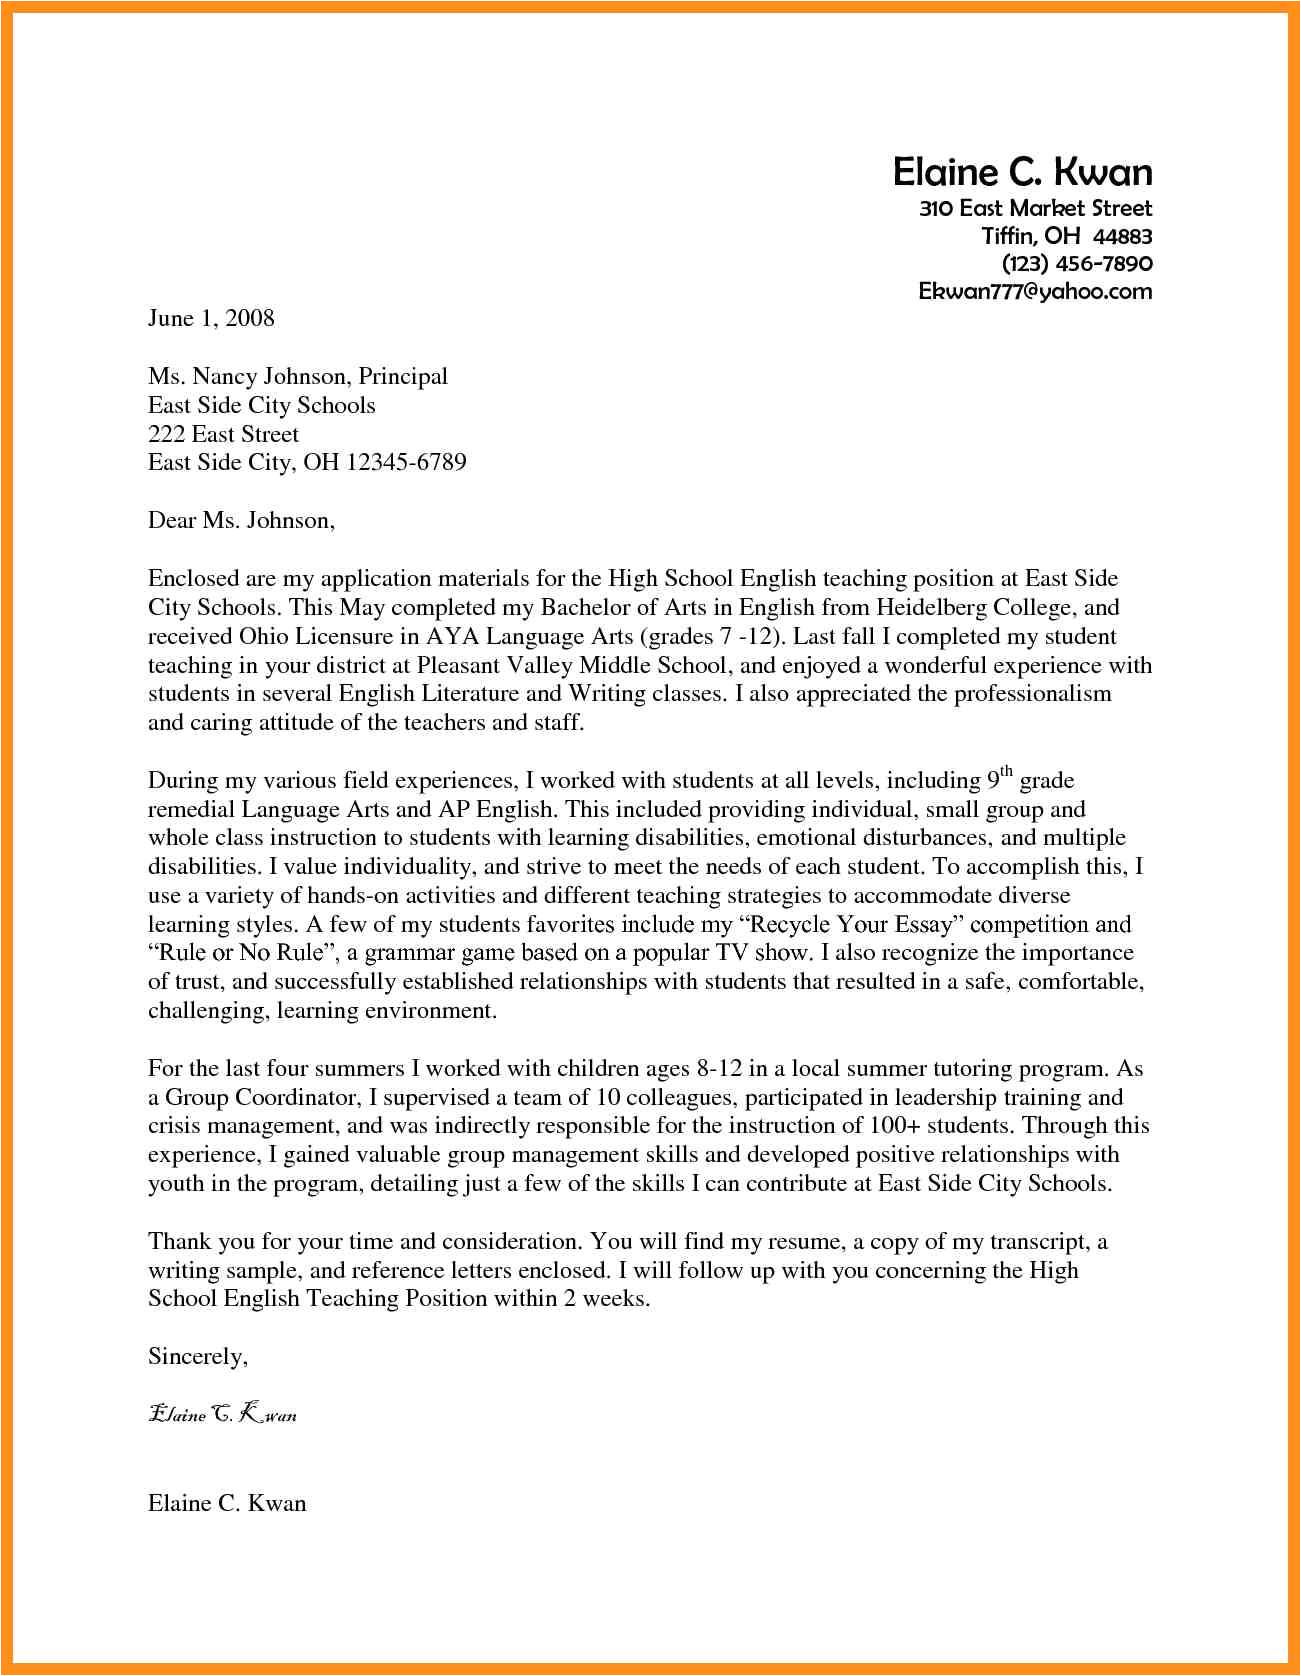 Cover Letter Samples for Teaching Positions Cover Letter Teaching Jobs Examples